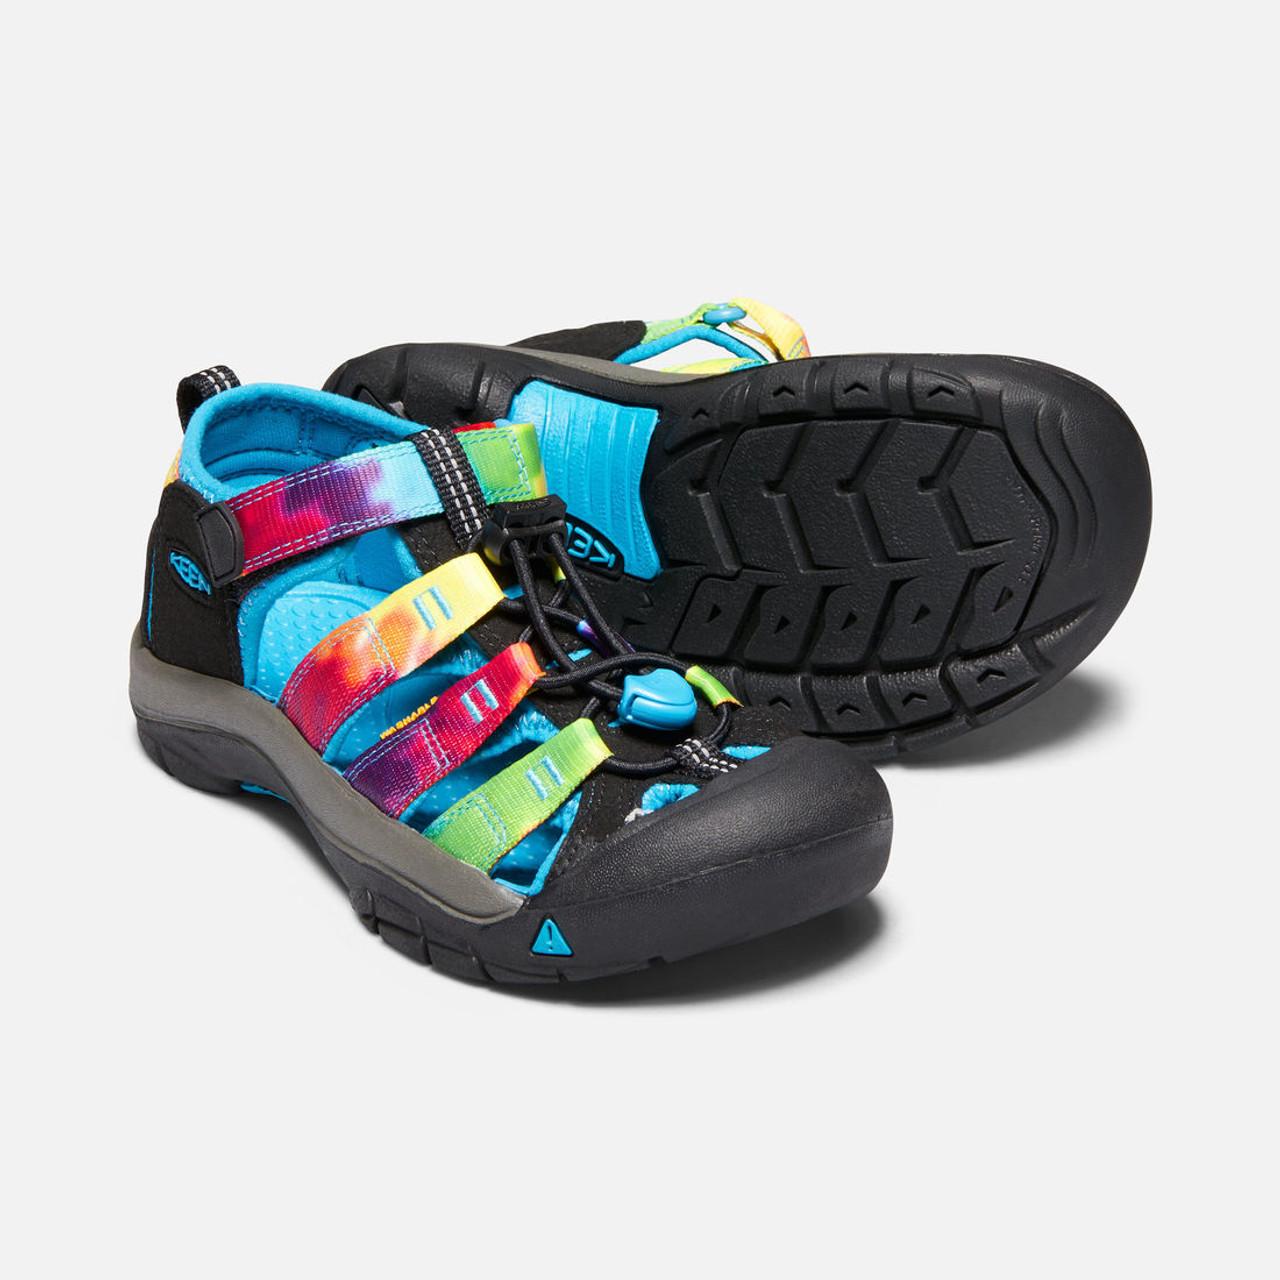 fb28786caefc KEEN Big Kids  Newport H2 Sandal - Herbert s Boots and Western Wear